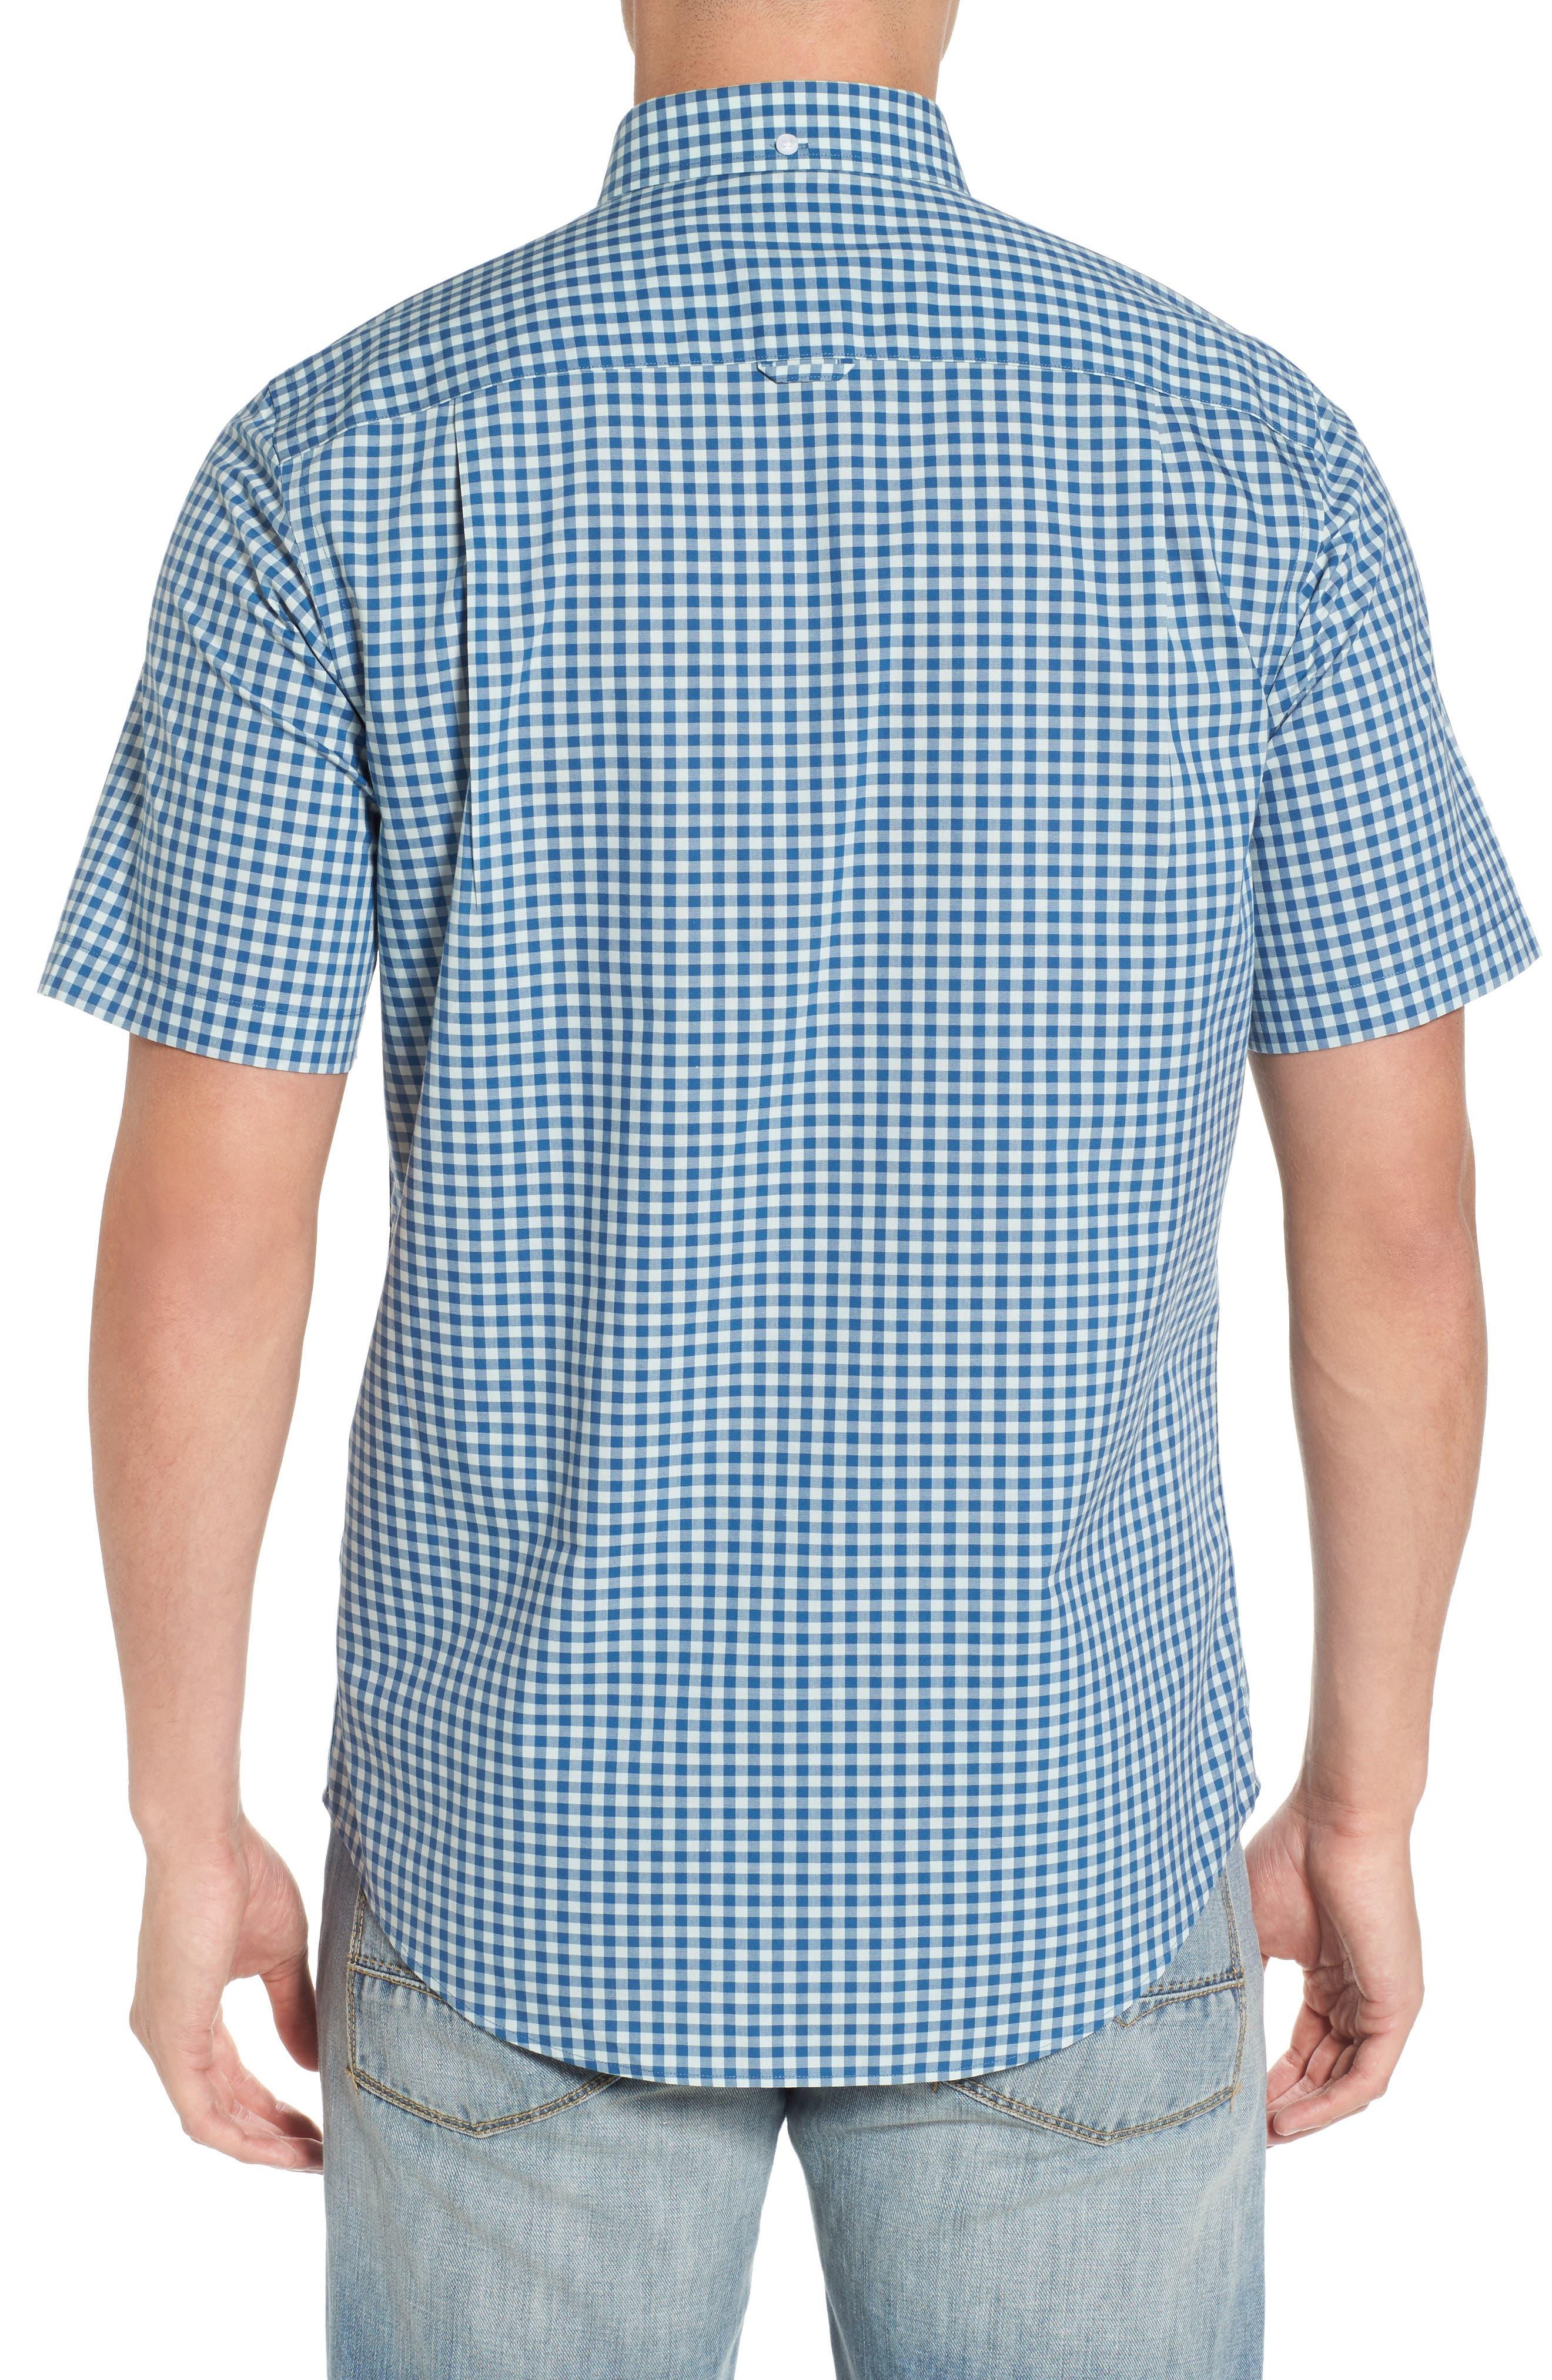 Regular Fit Gingham Sport Shirt,                             Alternate thumbnail 2, color,                             440